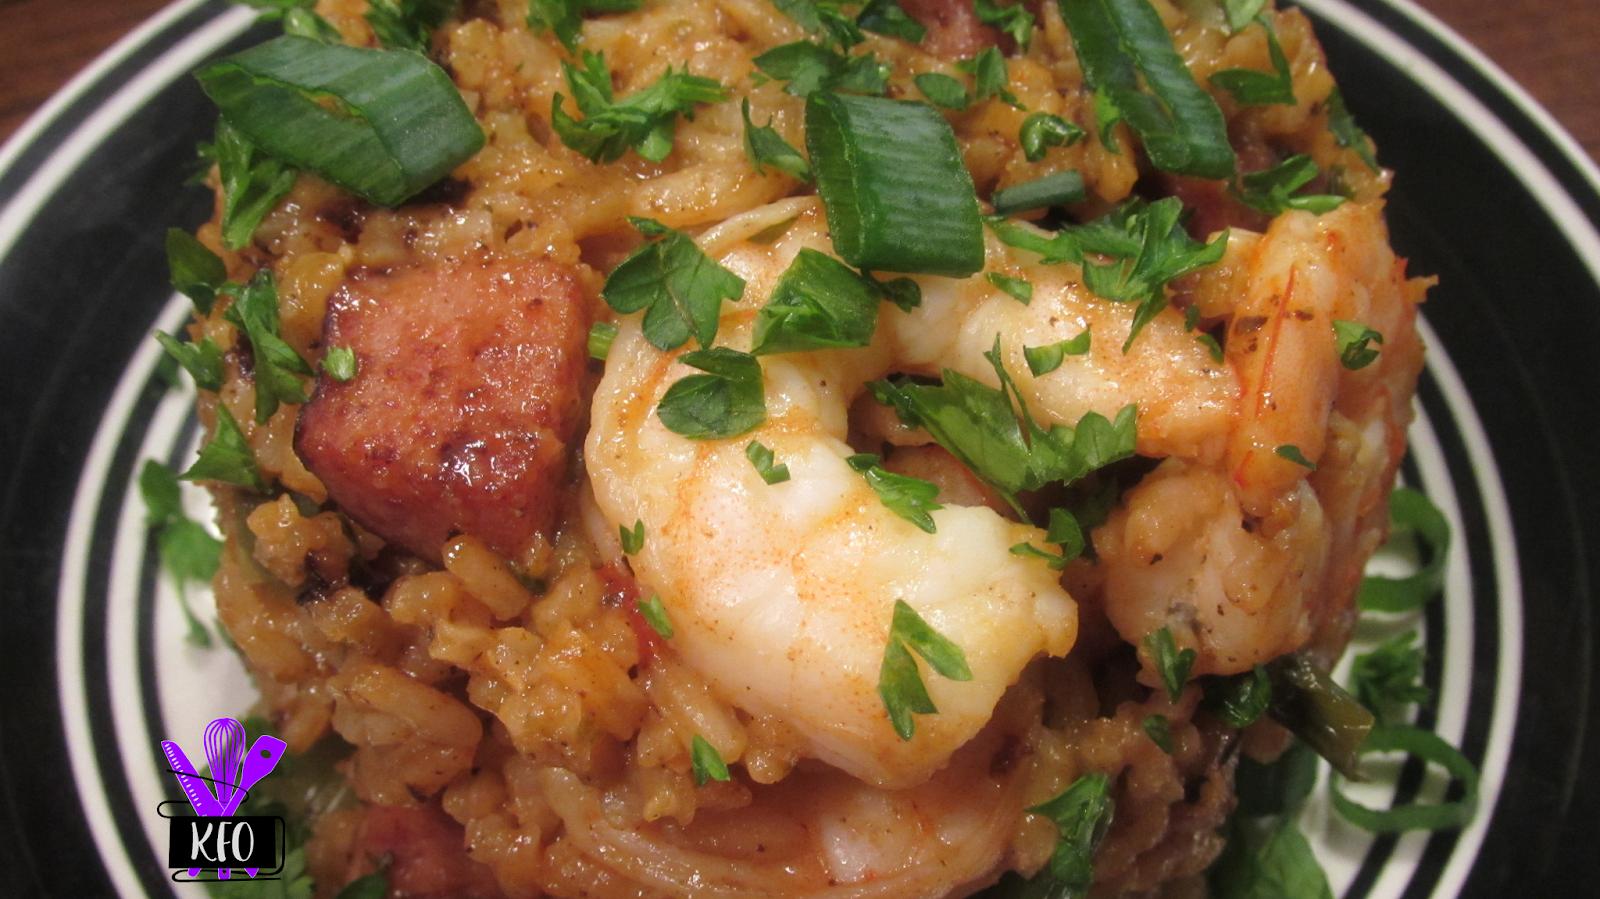 Creole style shrimp and sausage jambalaya forumfinder Gallery